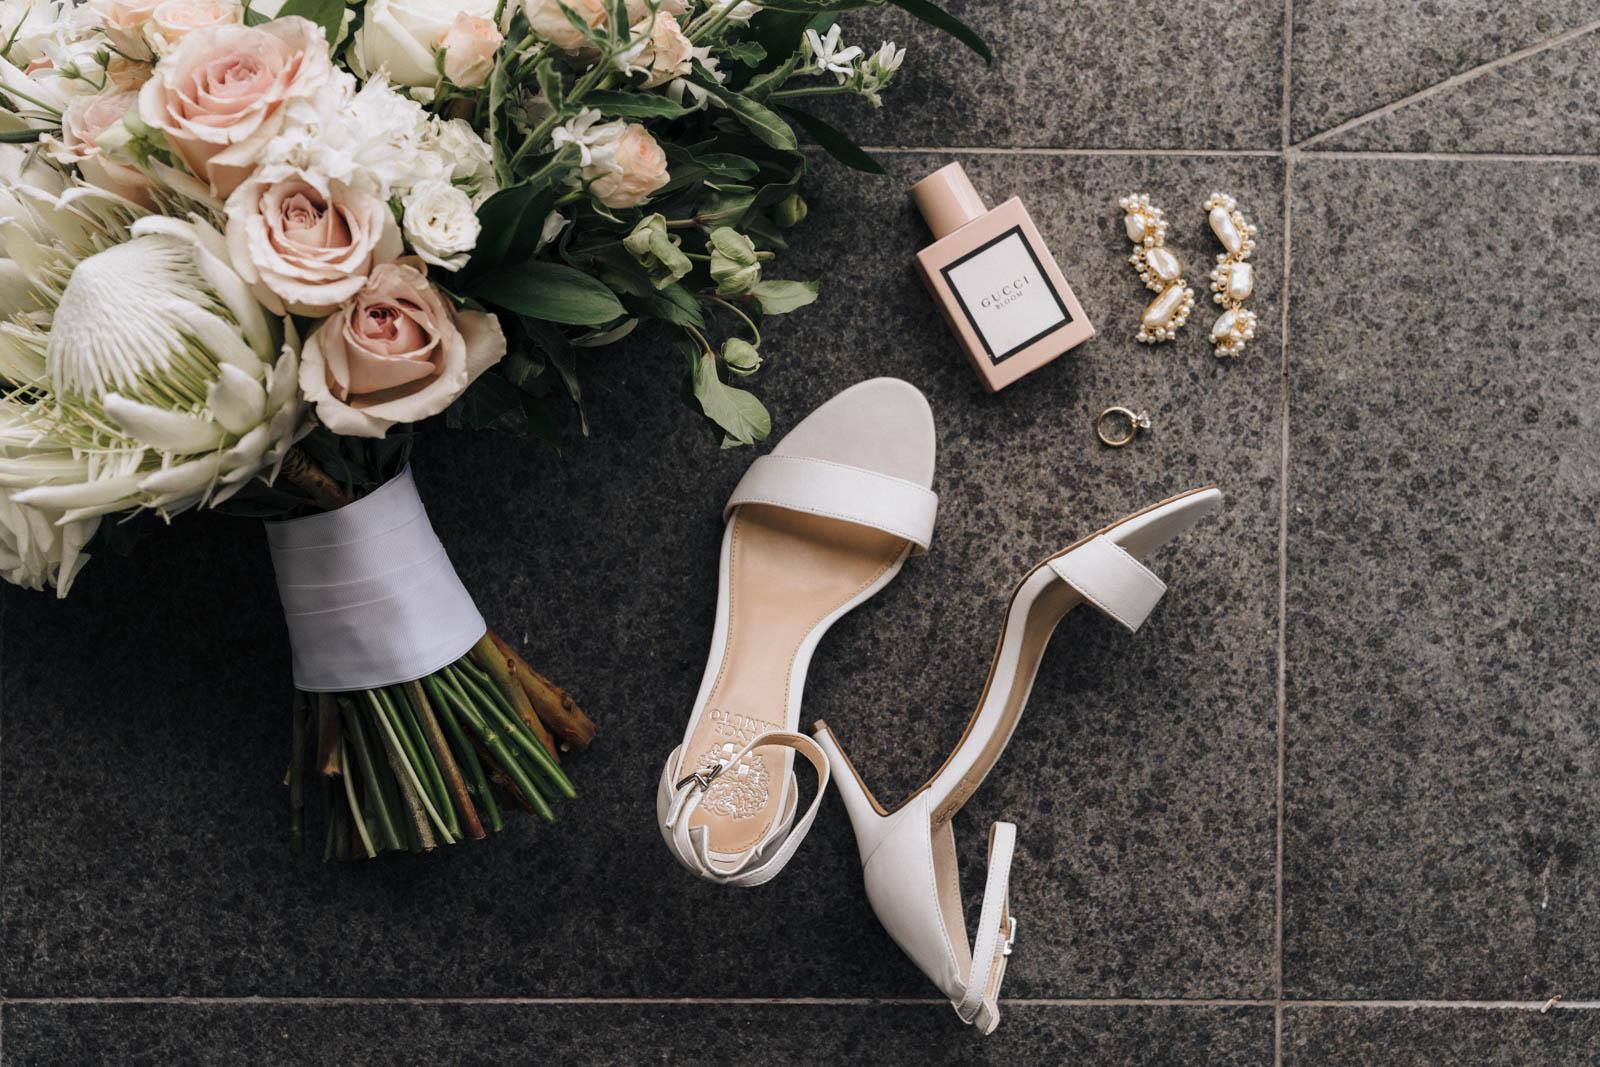 newfound-k-s-hilton-taupo-wedding-photographer-012